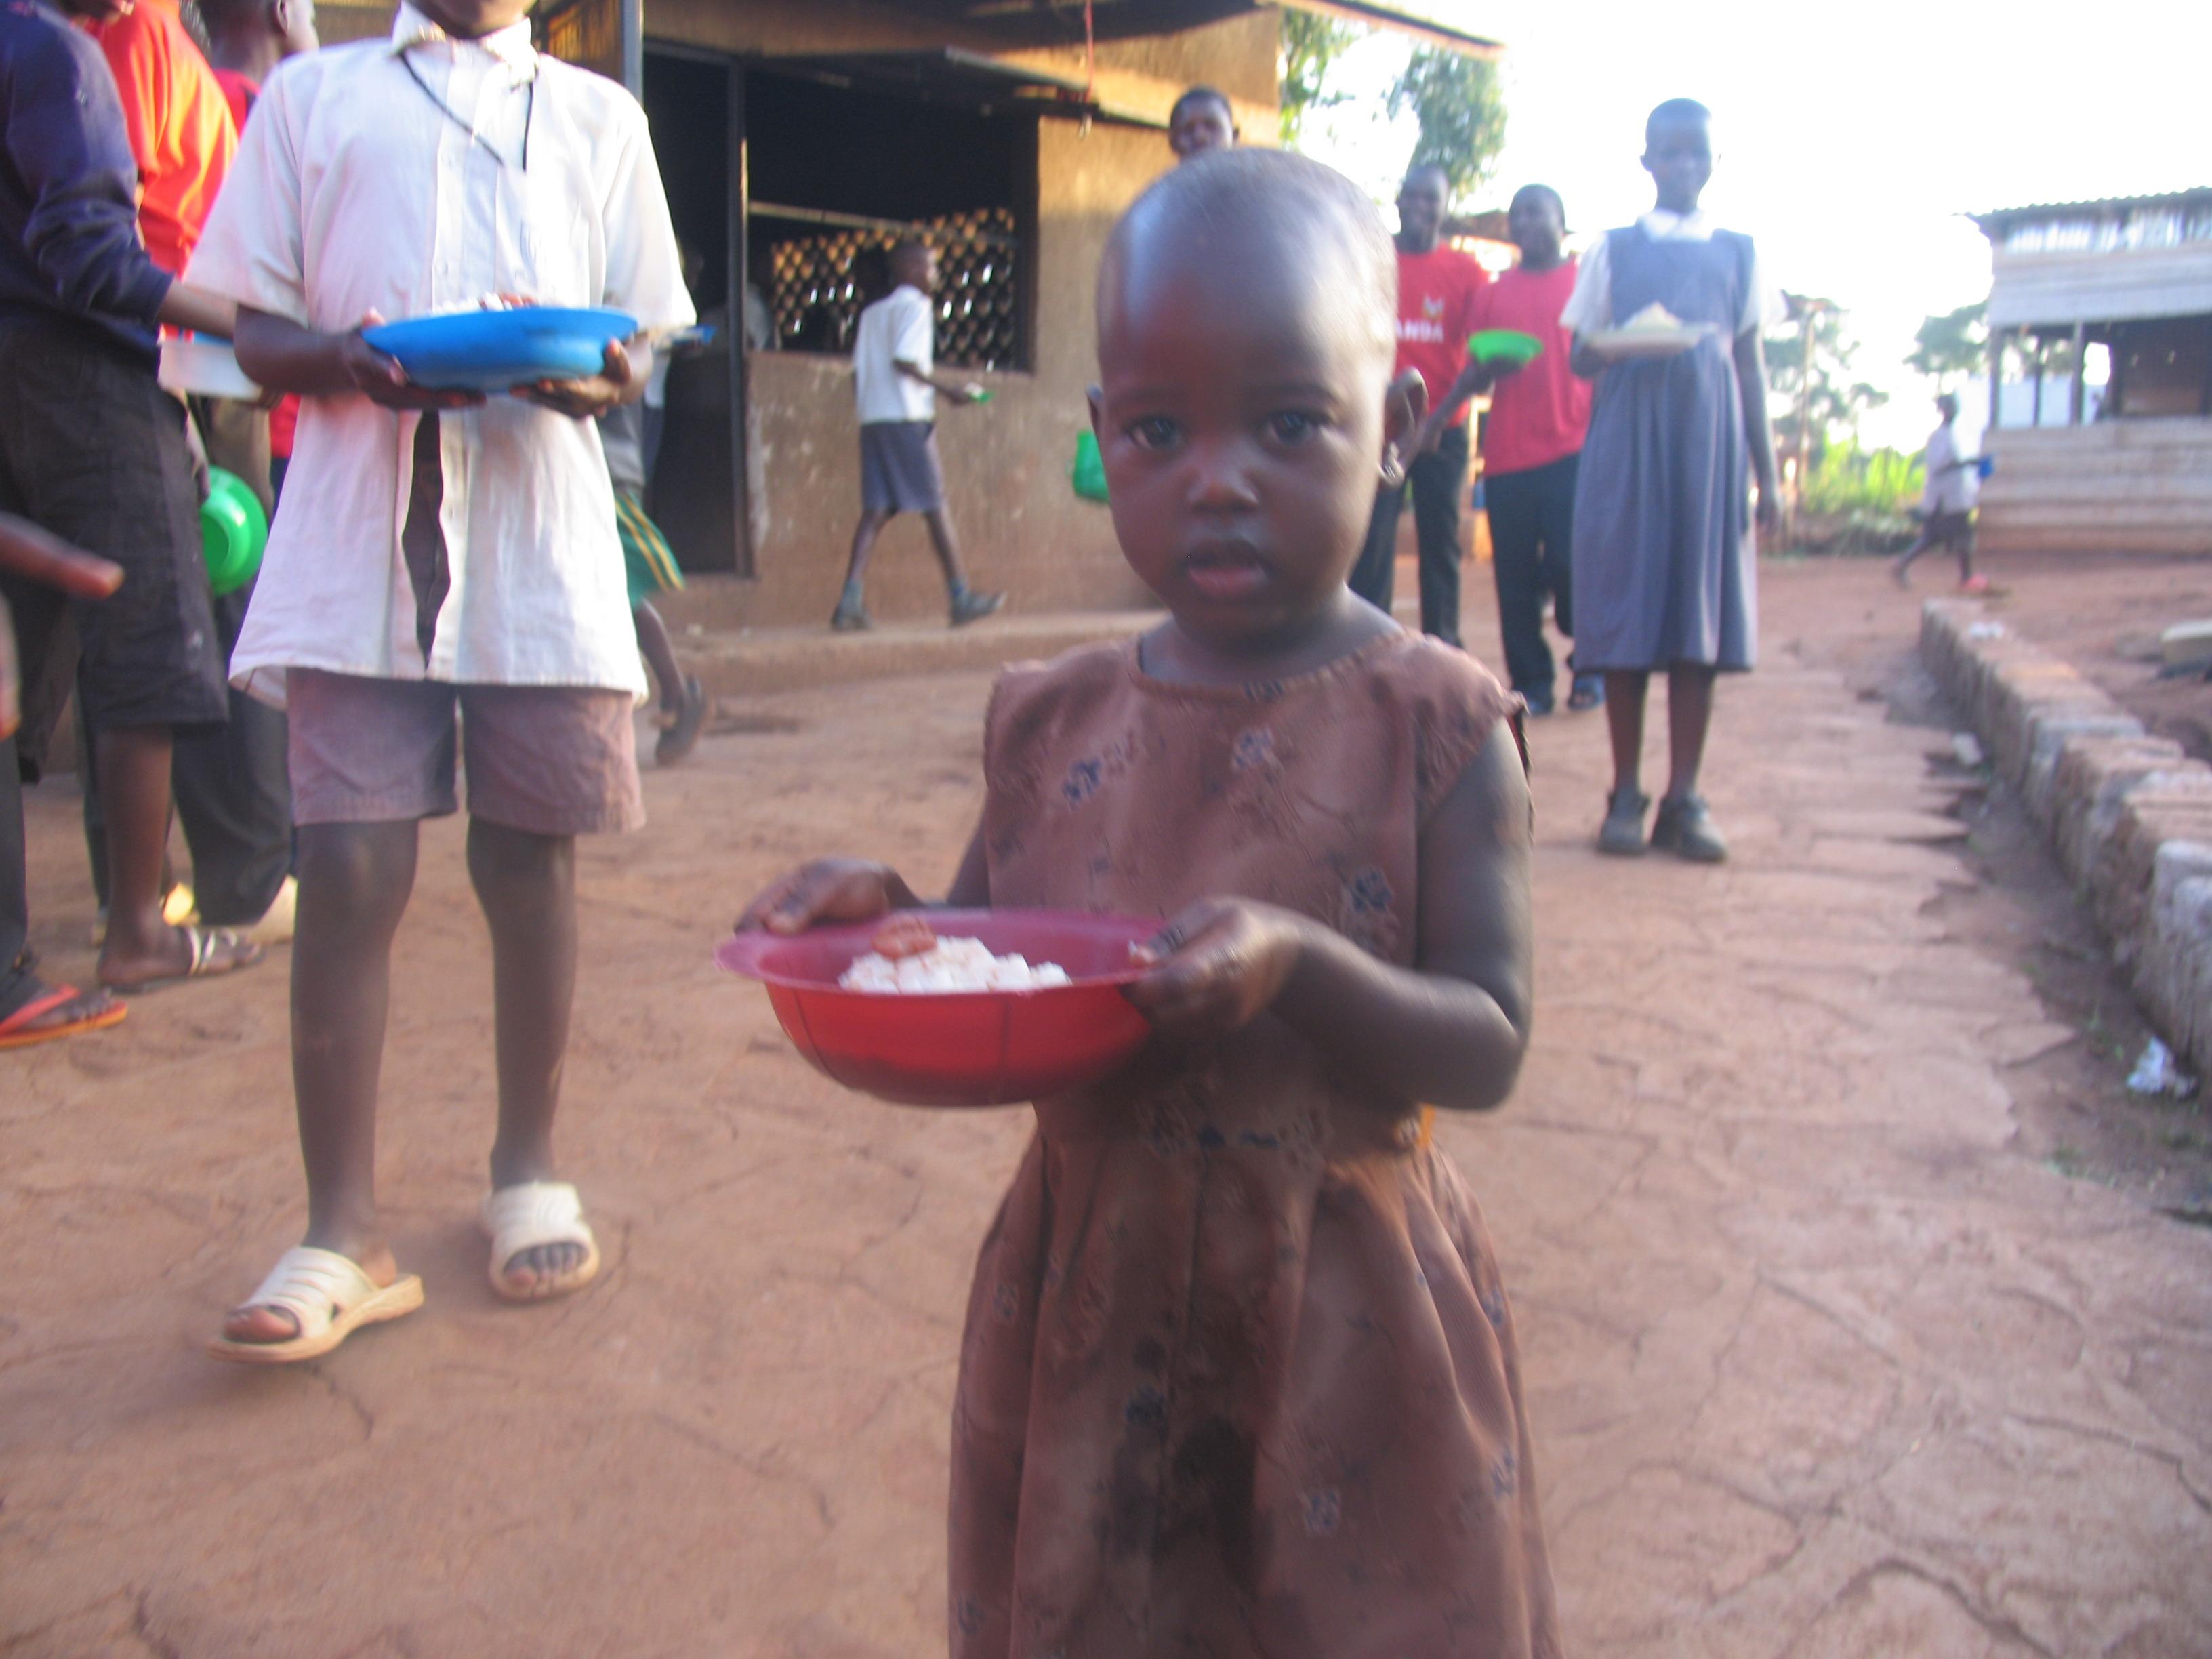 Just received dinner-Nkumba food program